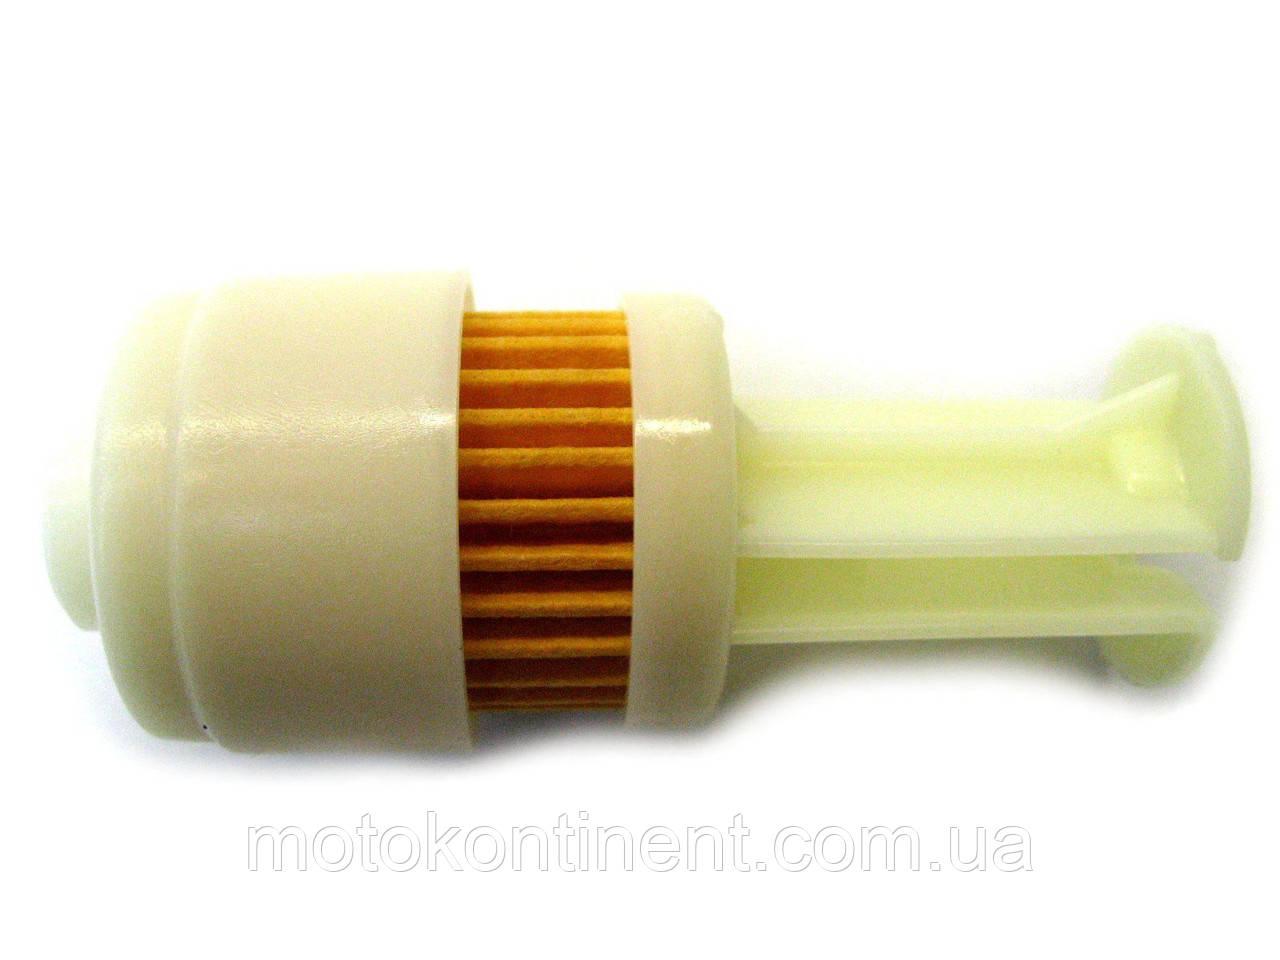 15412-93J00 Фильтр топливный Suzuki DF200-300